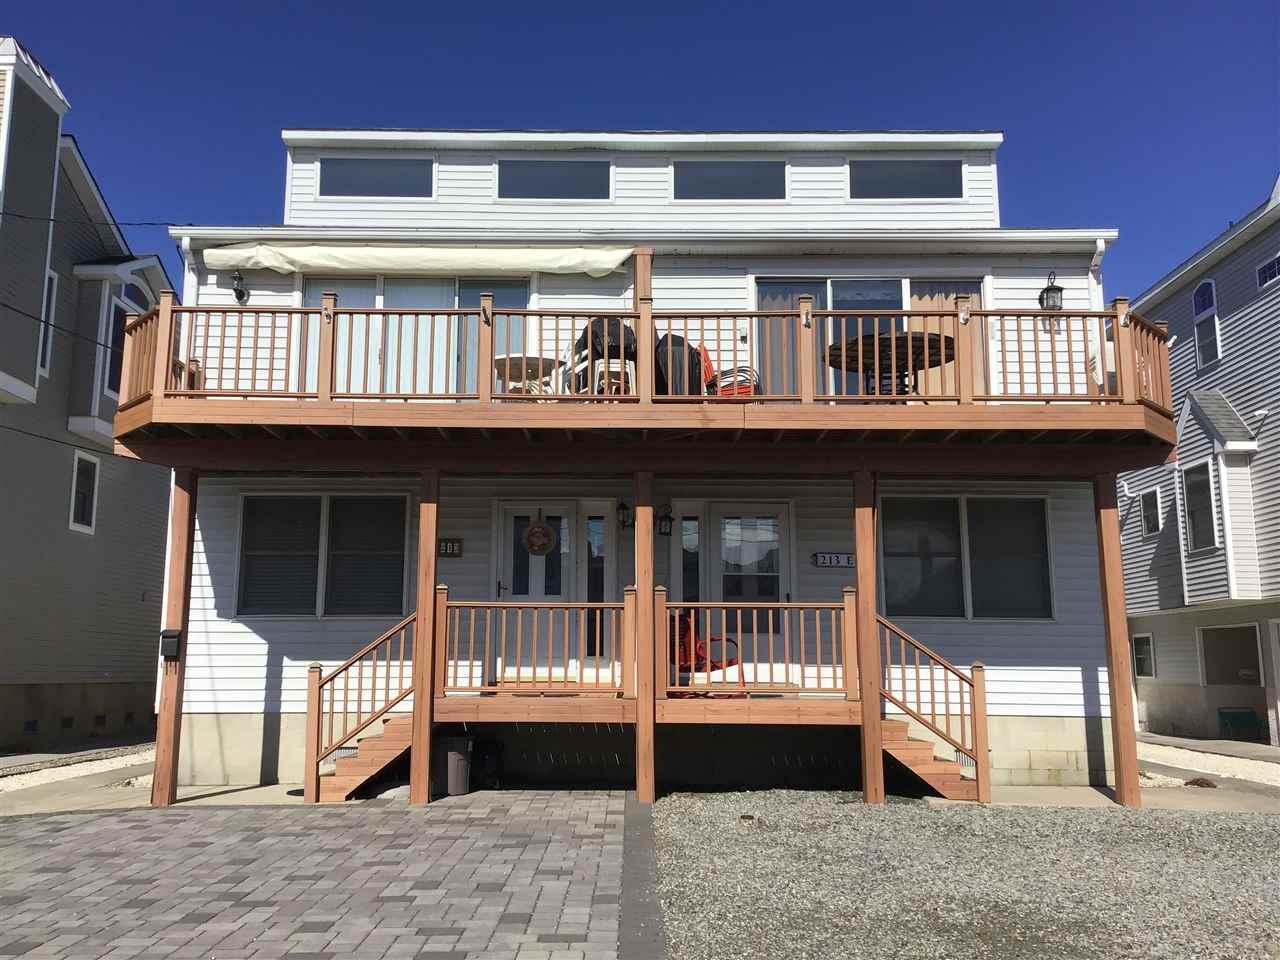 213, East Unit 83rd, Sea Isle City